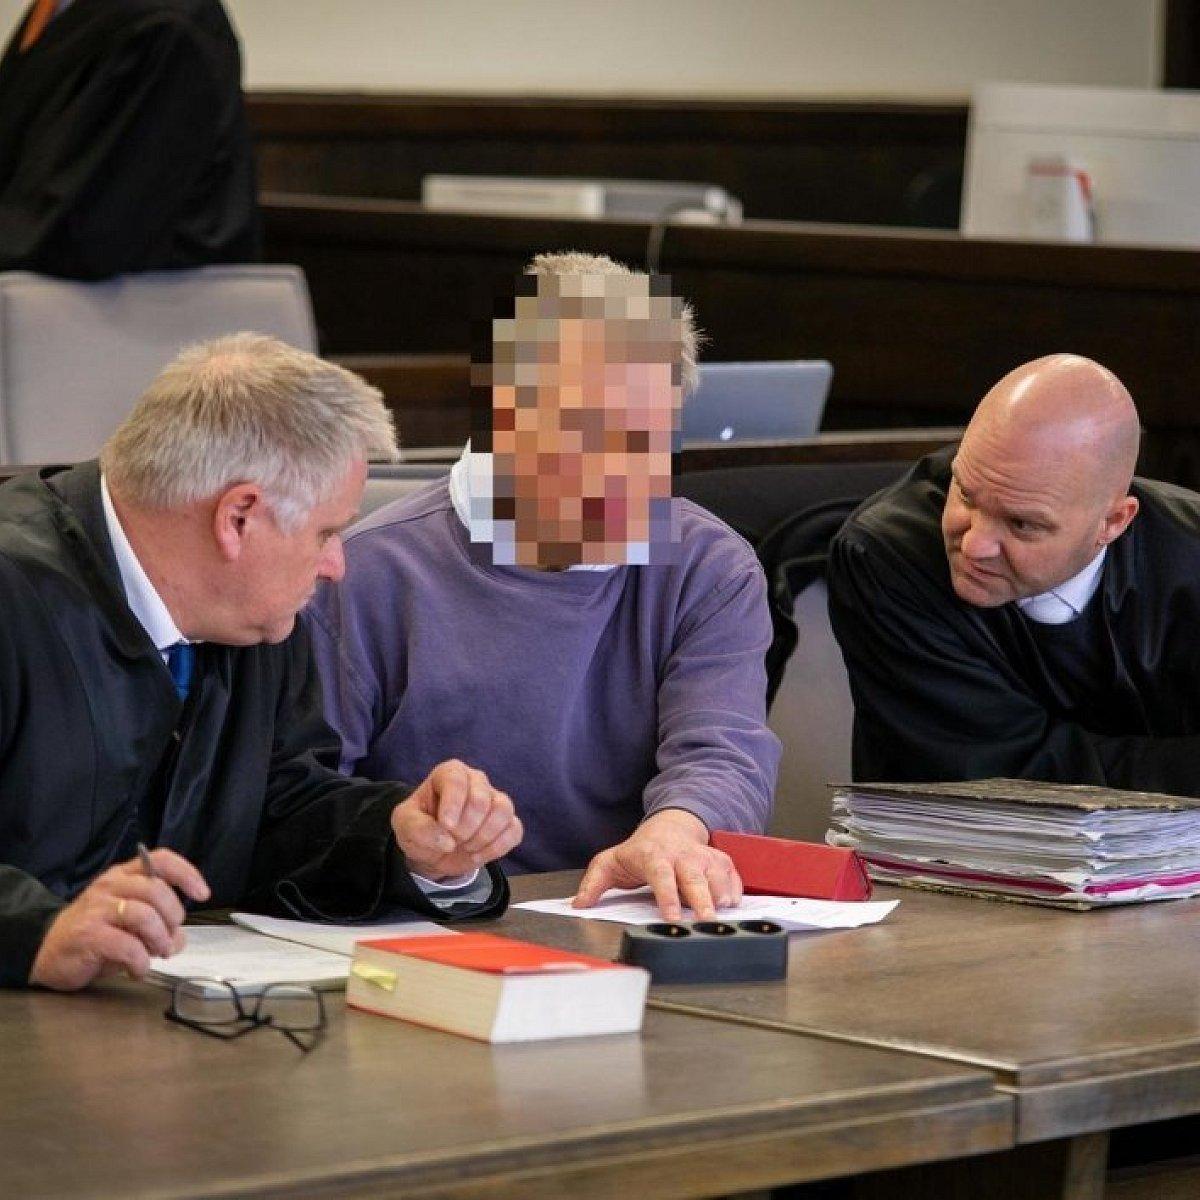 Prozess um Biersteuer-Betrug wird nach Corona-Zwangspause fortgesetzt |  nw.de